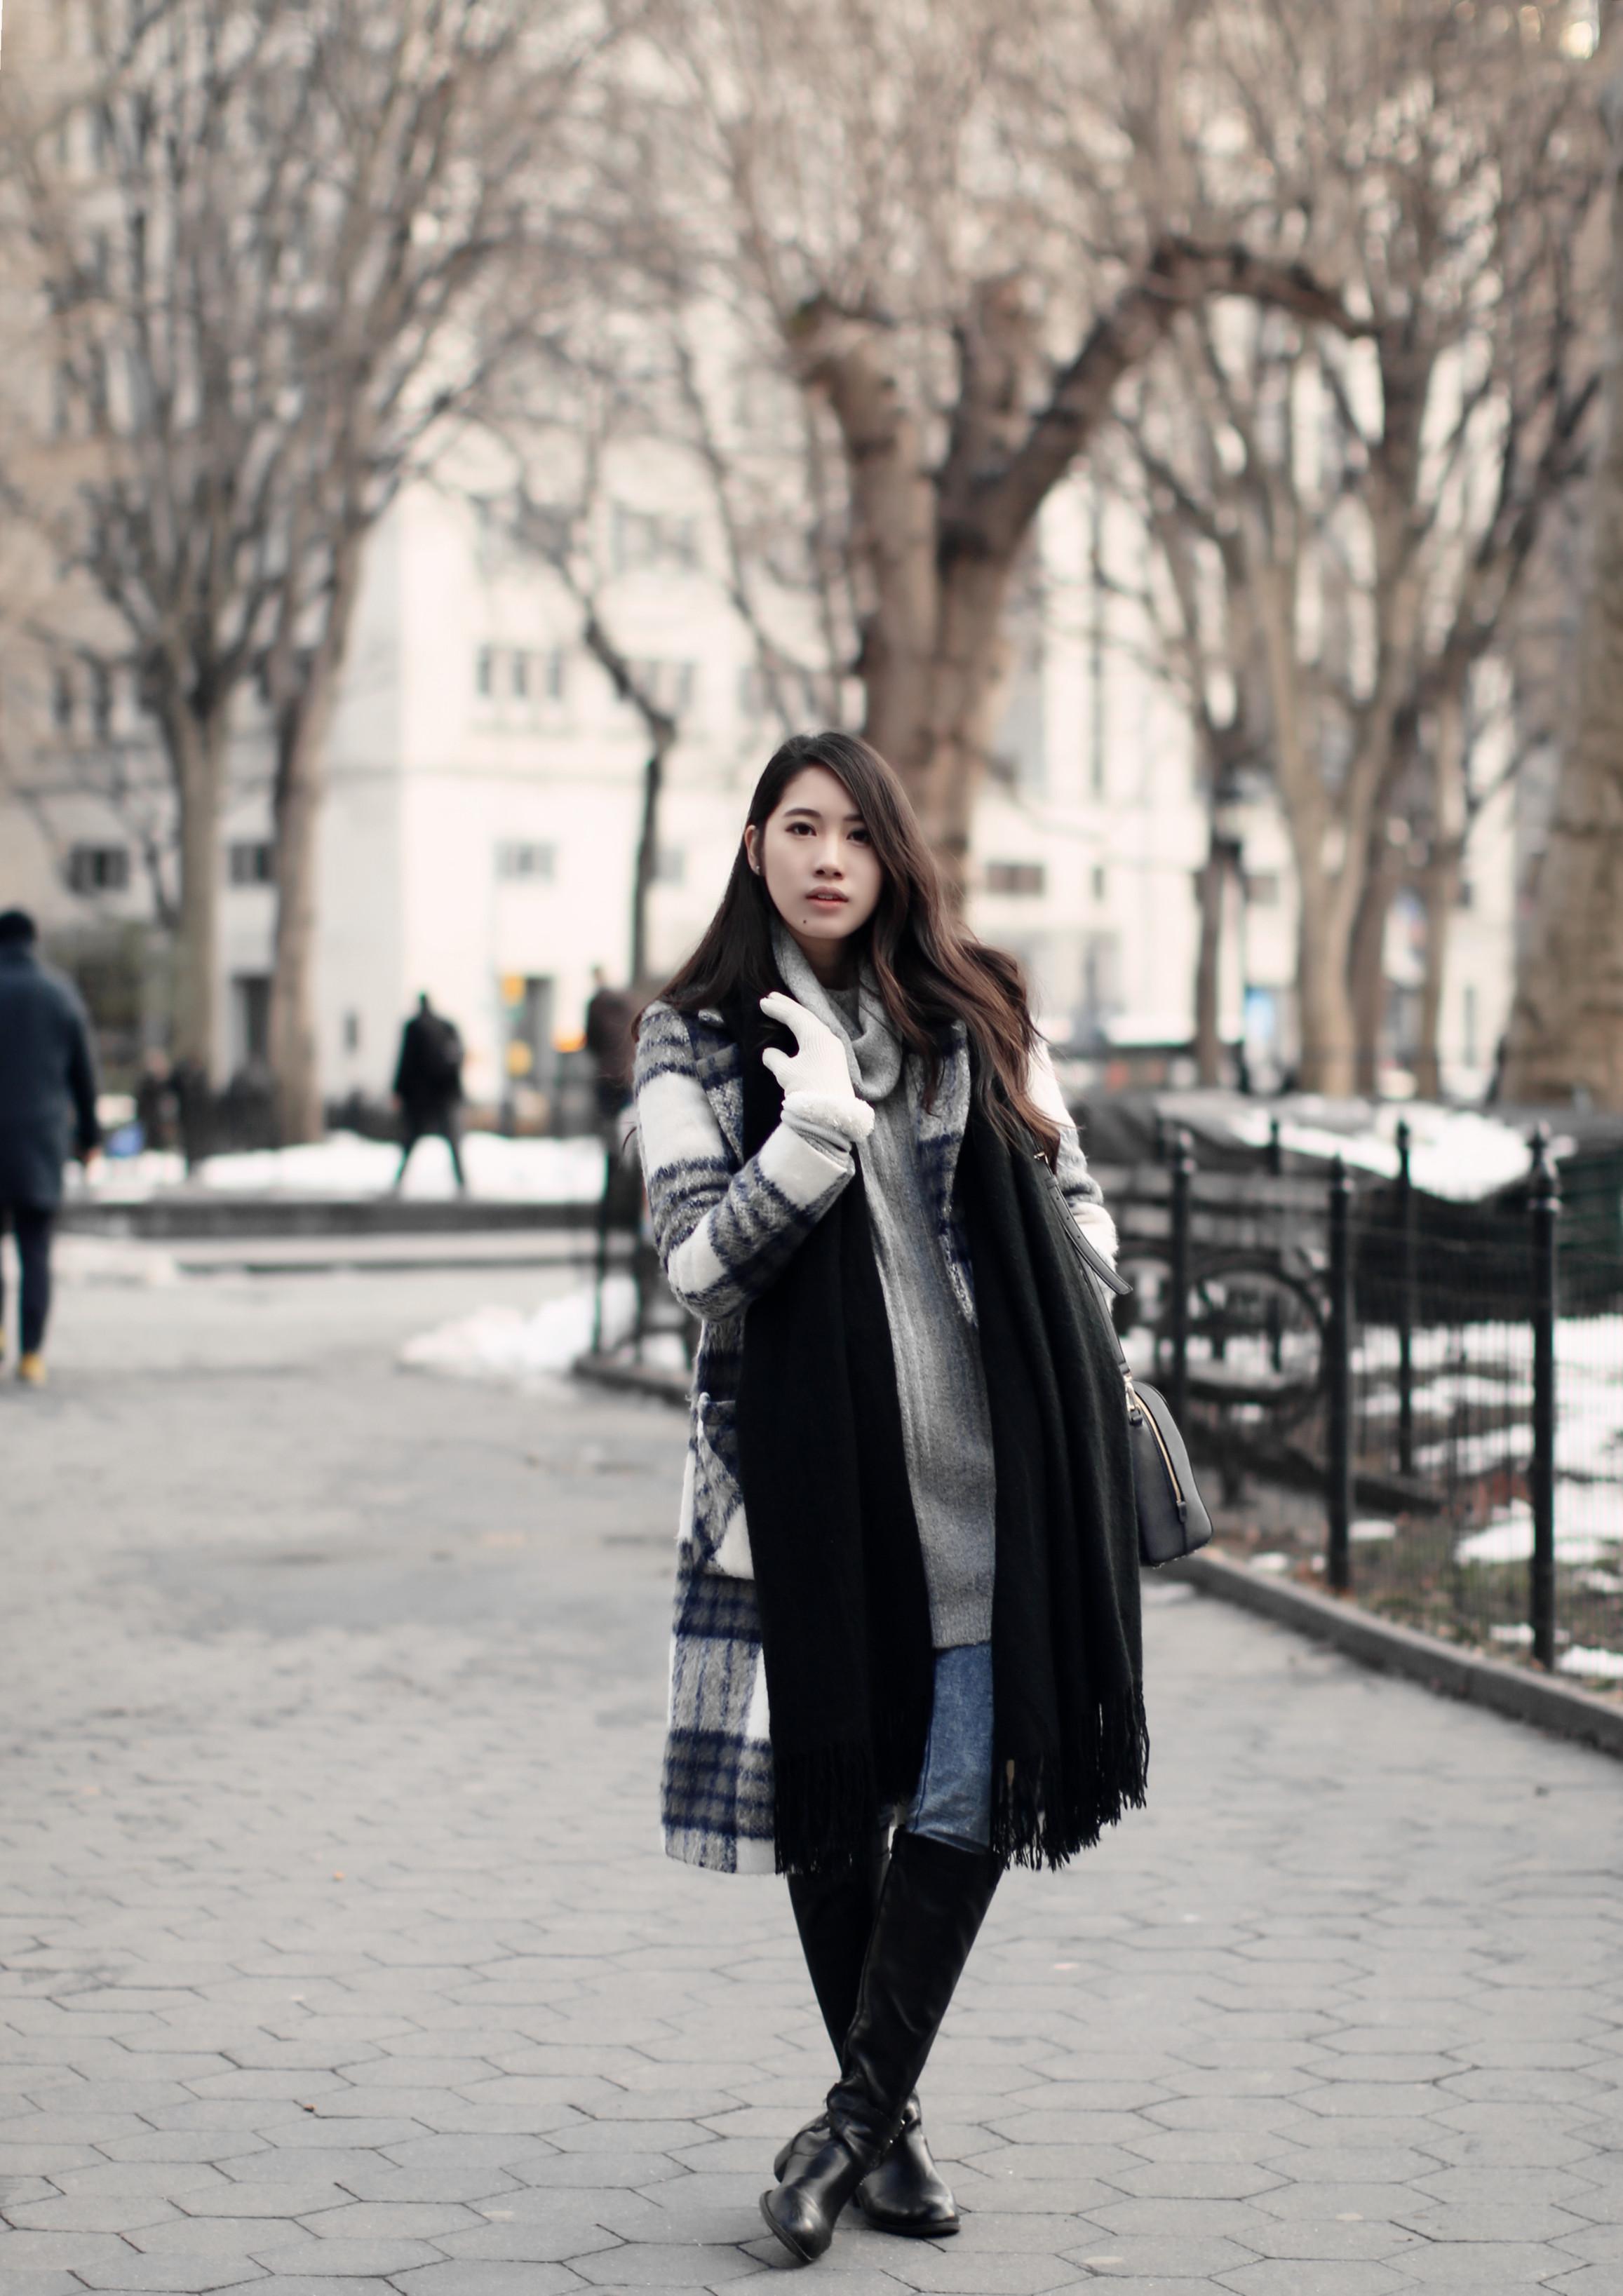 2081-clothestoyouuu-elizabeeetht-nyfw-newyorkfashionweek-nyc-fashionweek-newyork- winter2017-fashion-ootd